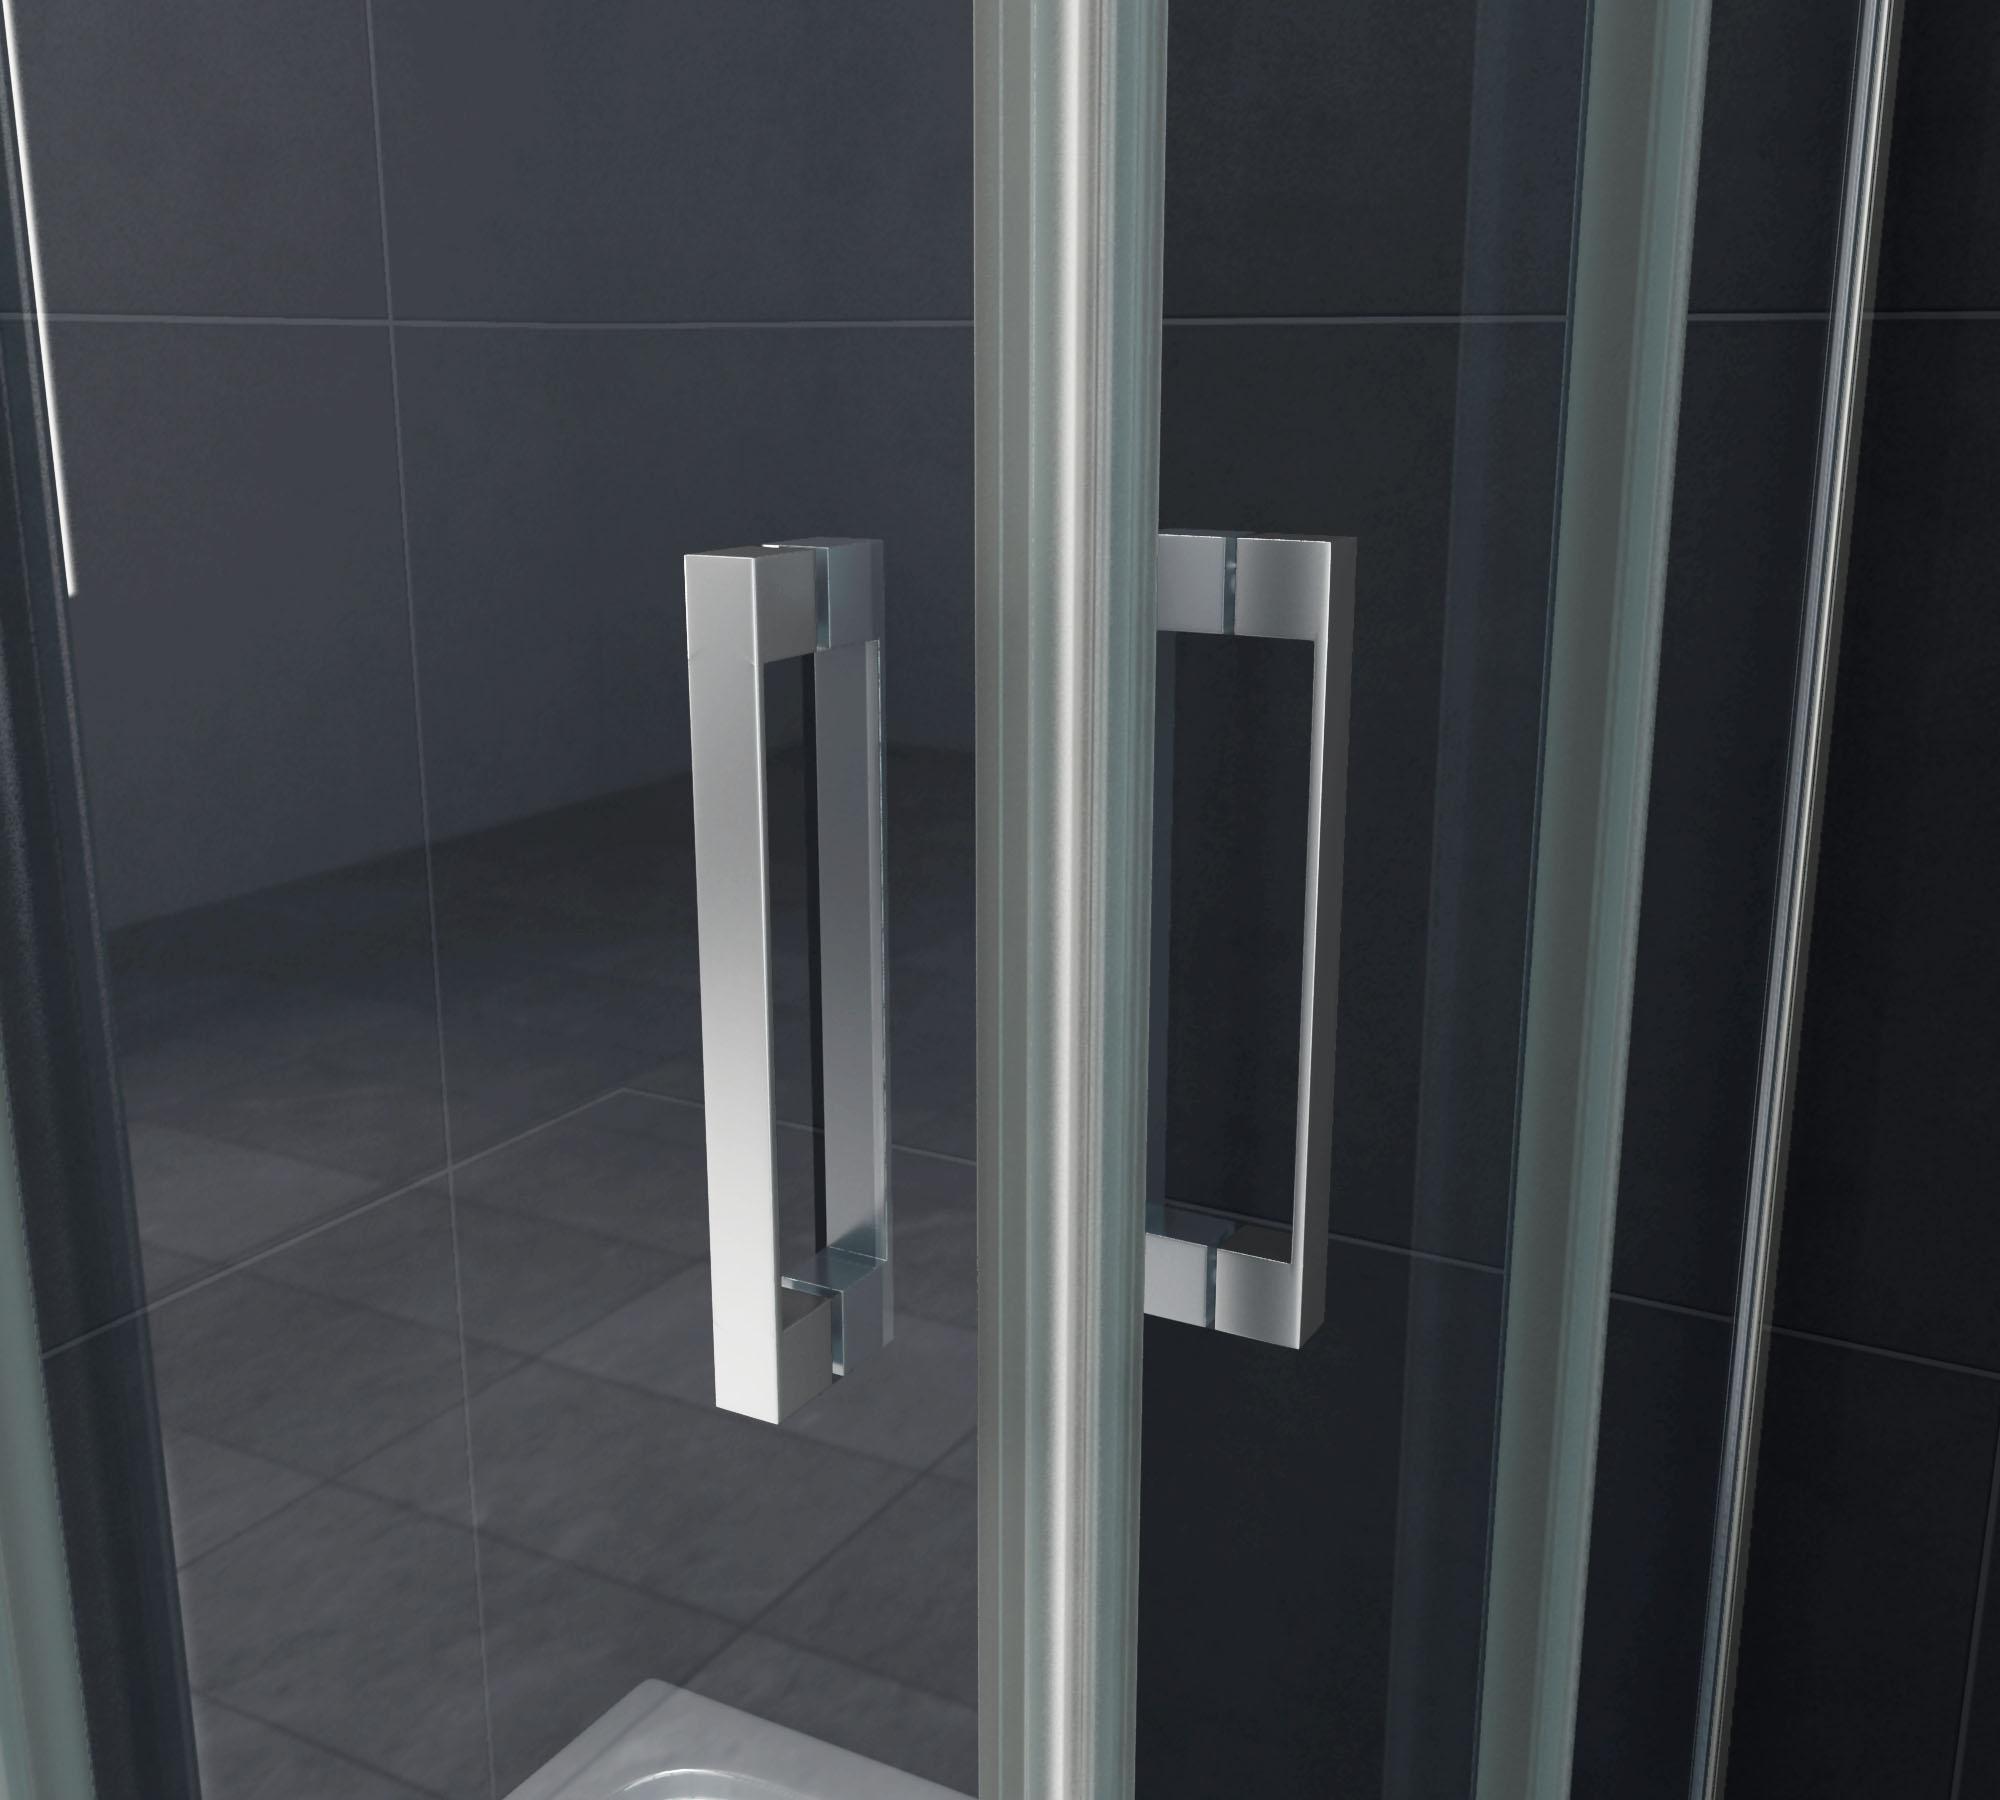 Duschkabine TELA 100 x 100 x 200 cm inkl. Duschtasse